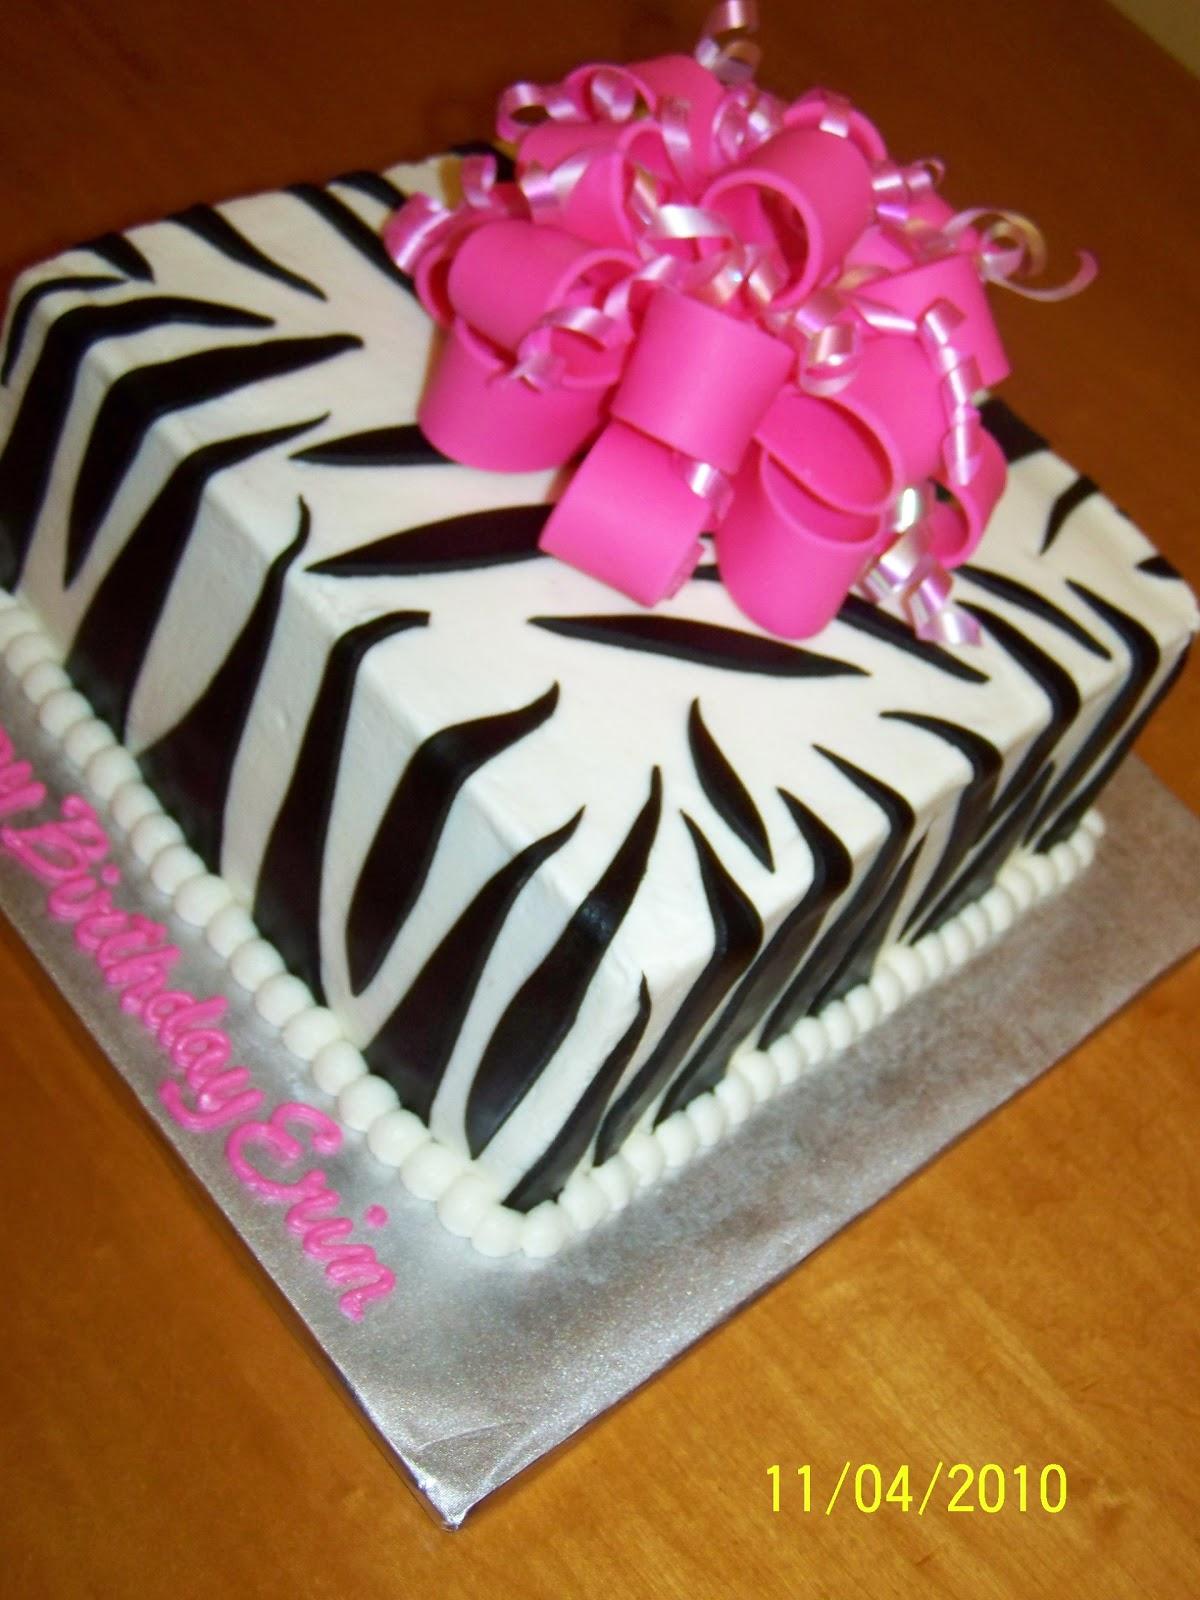 Pink and Black Zebra Cake Square